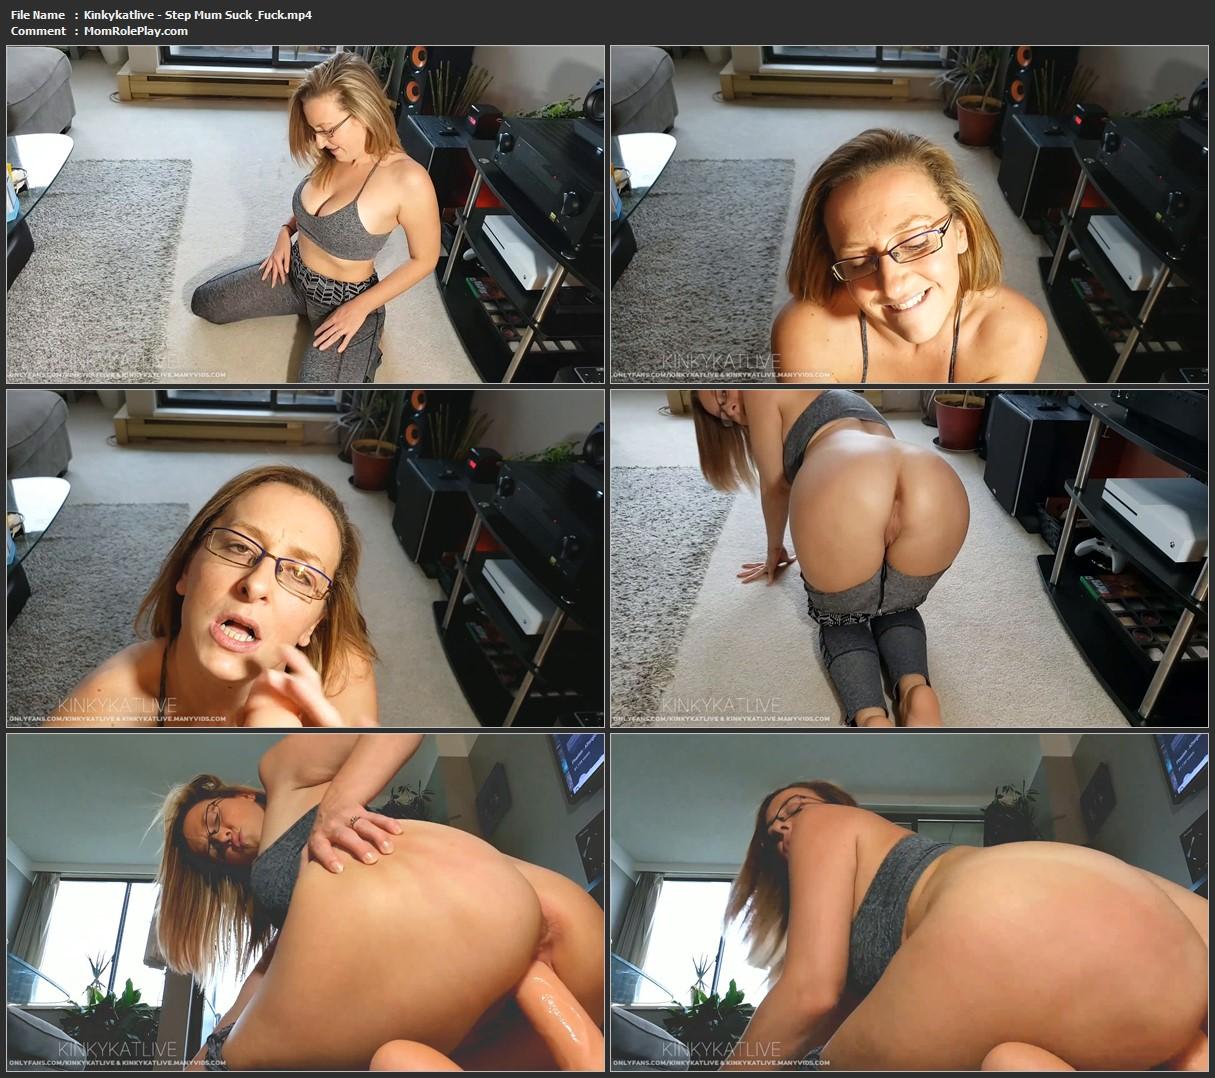 Kinkykatlive - Step Mum Suck & Fuck